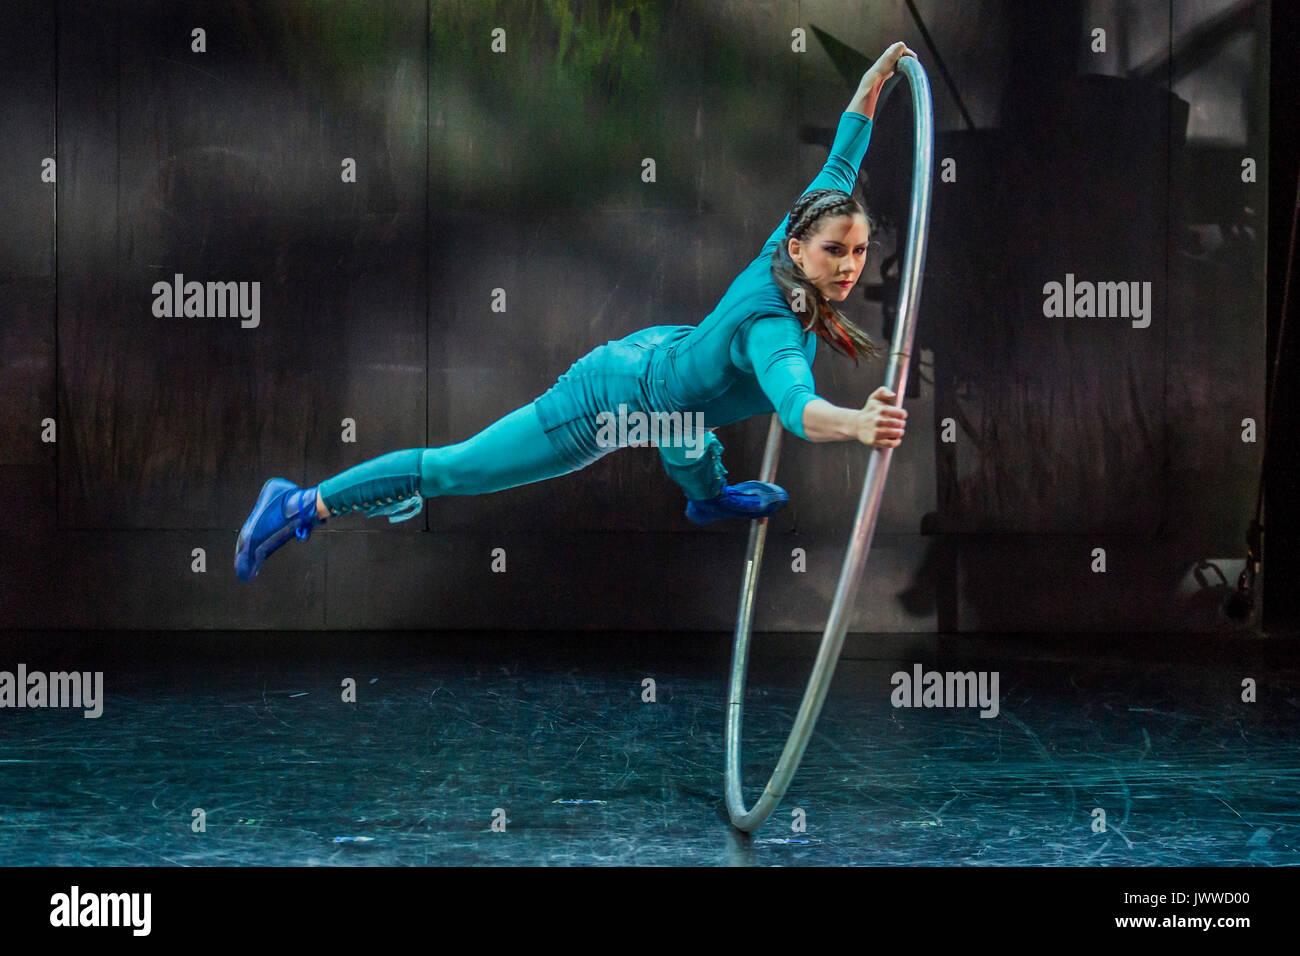 London, UK. 14th August, 2017. A Cyr wheel display by Sarah Lett - Cirkus Cirkör perform the UK premiere of Limits Stock Photo